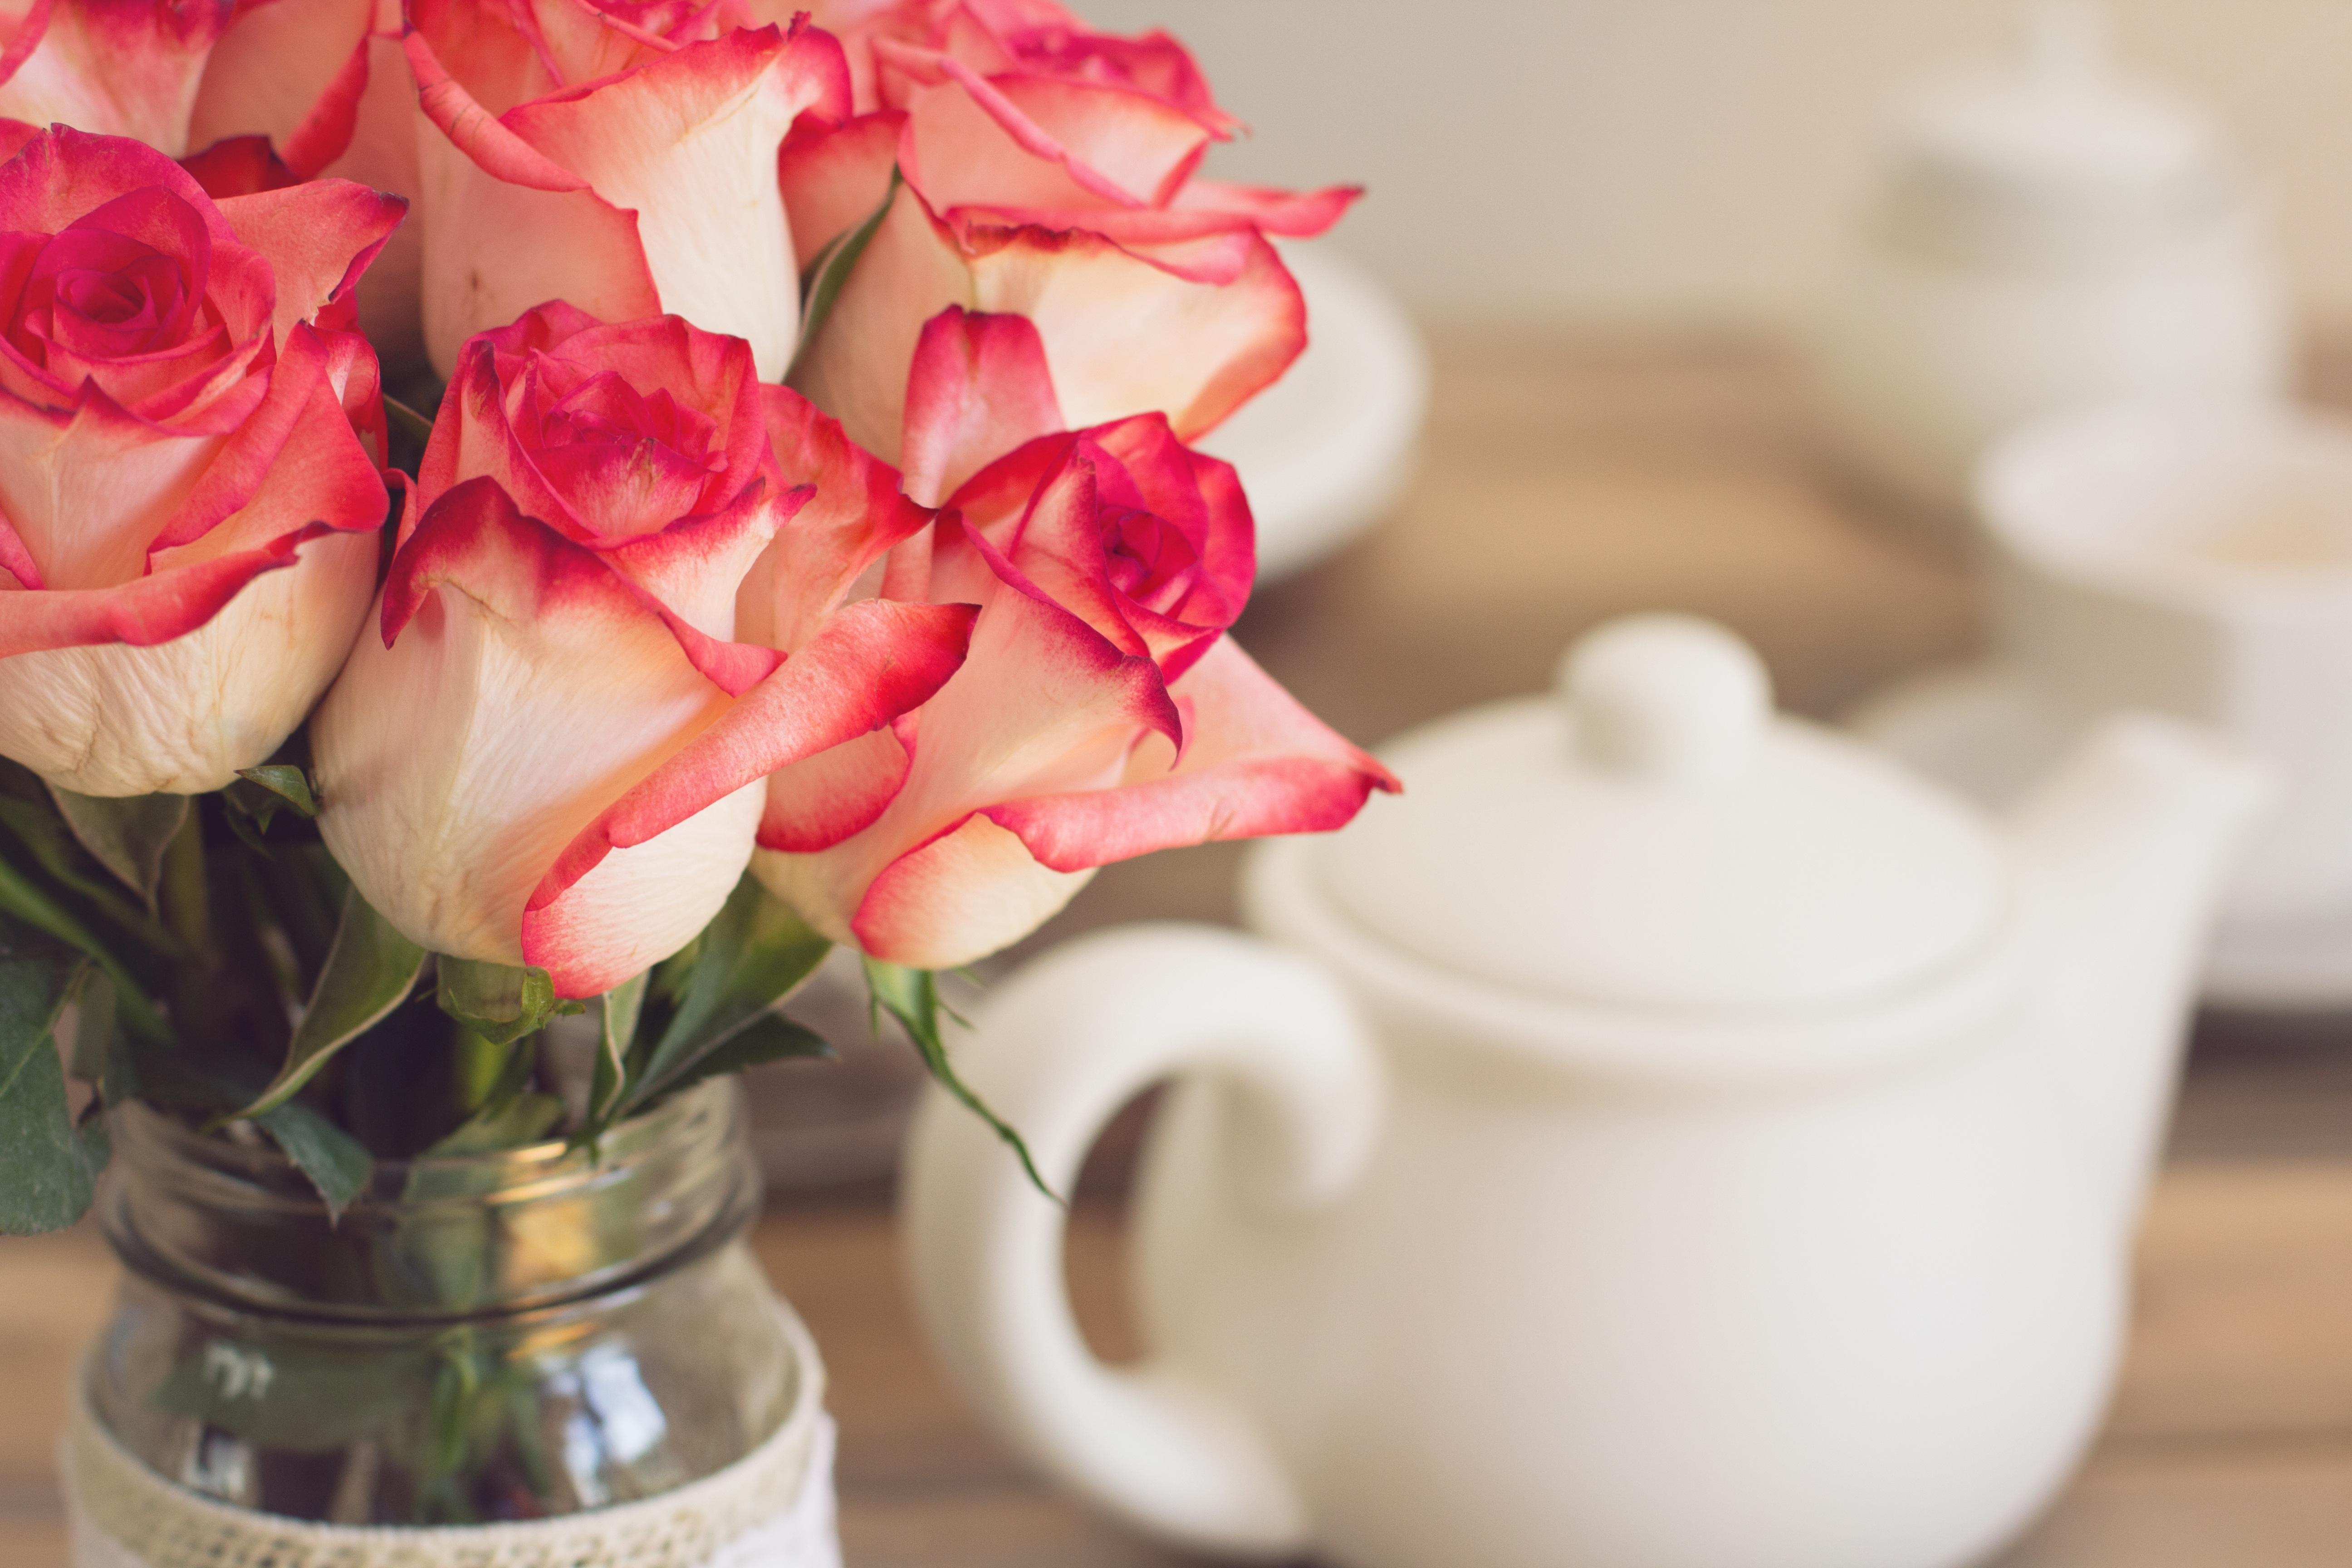 Free images petal teapot pink roses floristry flowering plant plant flower petal teapot bouquet pink roses floristry flowering plant shabby chic flower bouquet tea party izmirmasajfo